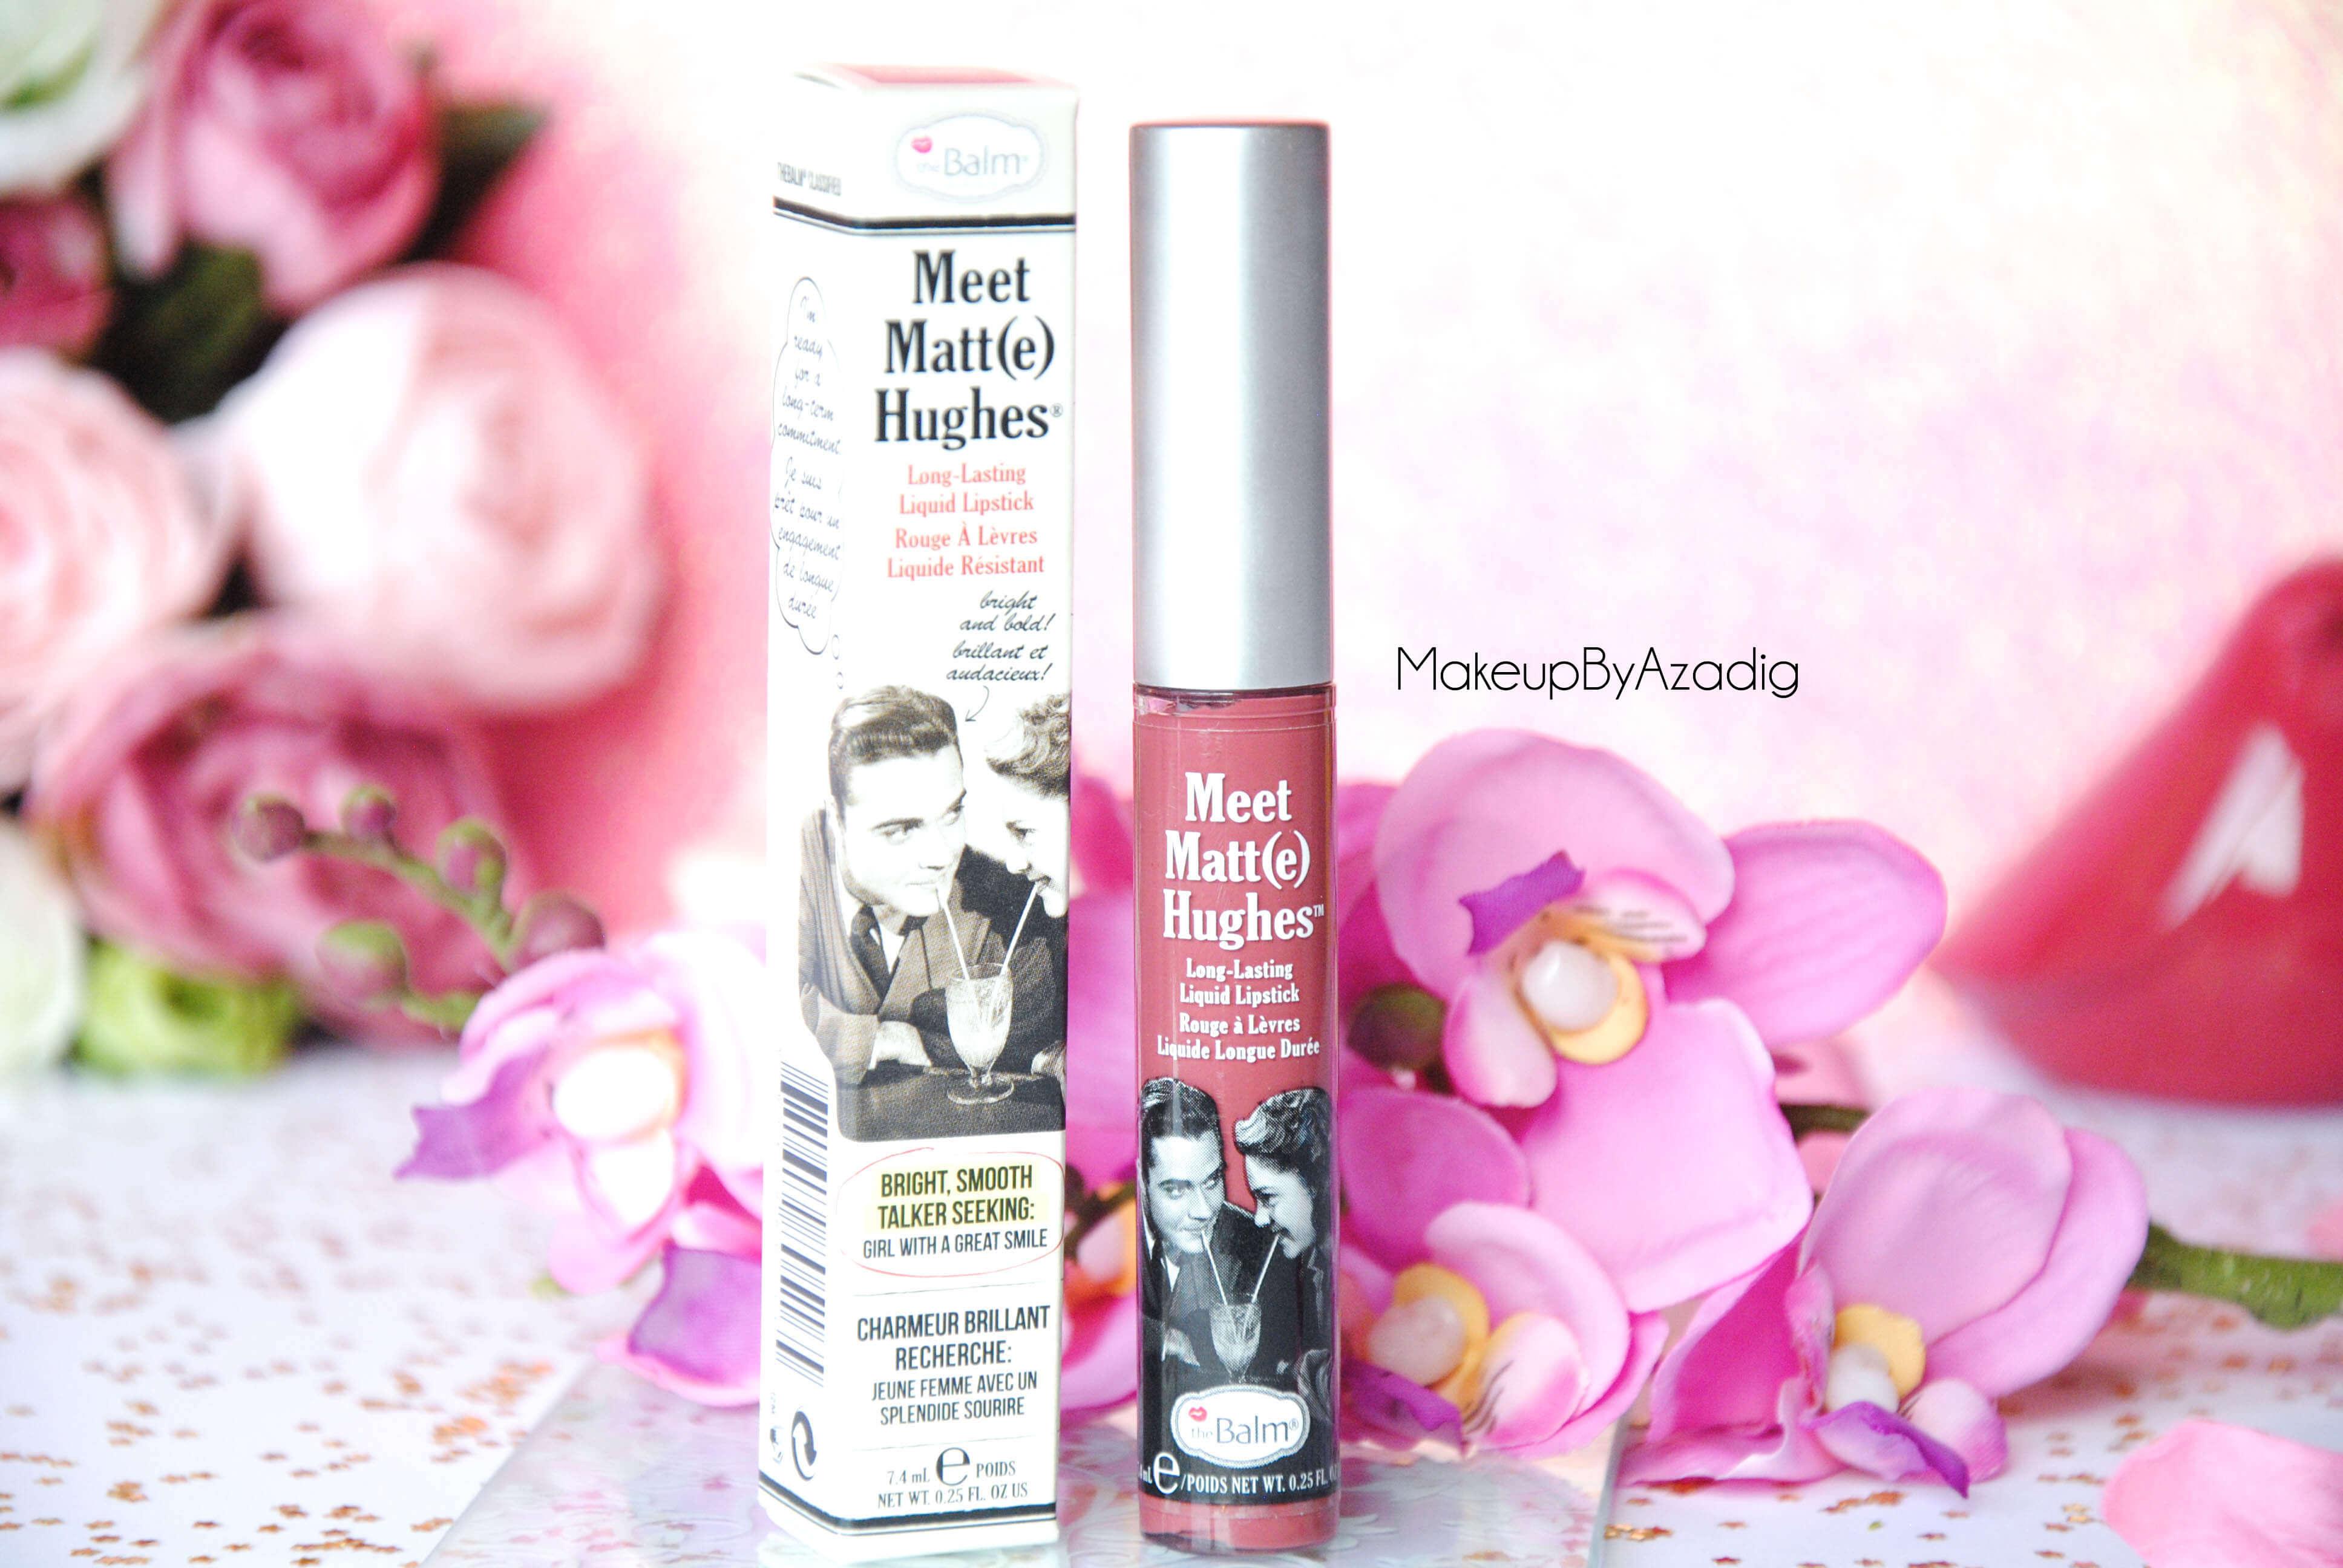 meet-matte-hughes-the-balm-charming-makeupbyazadig-troyes-paris-rouge-levres-liquide-swatch-review-avis-miniature